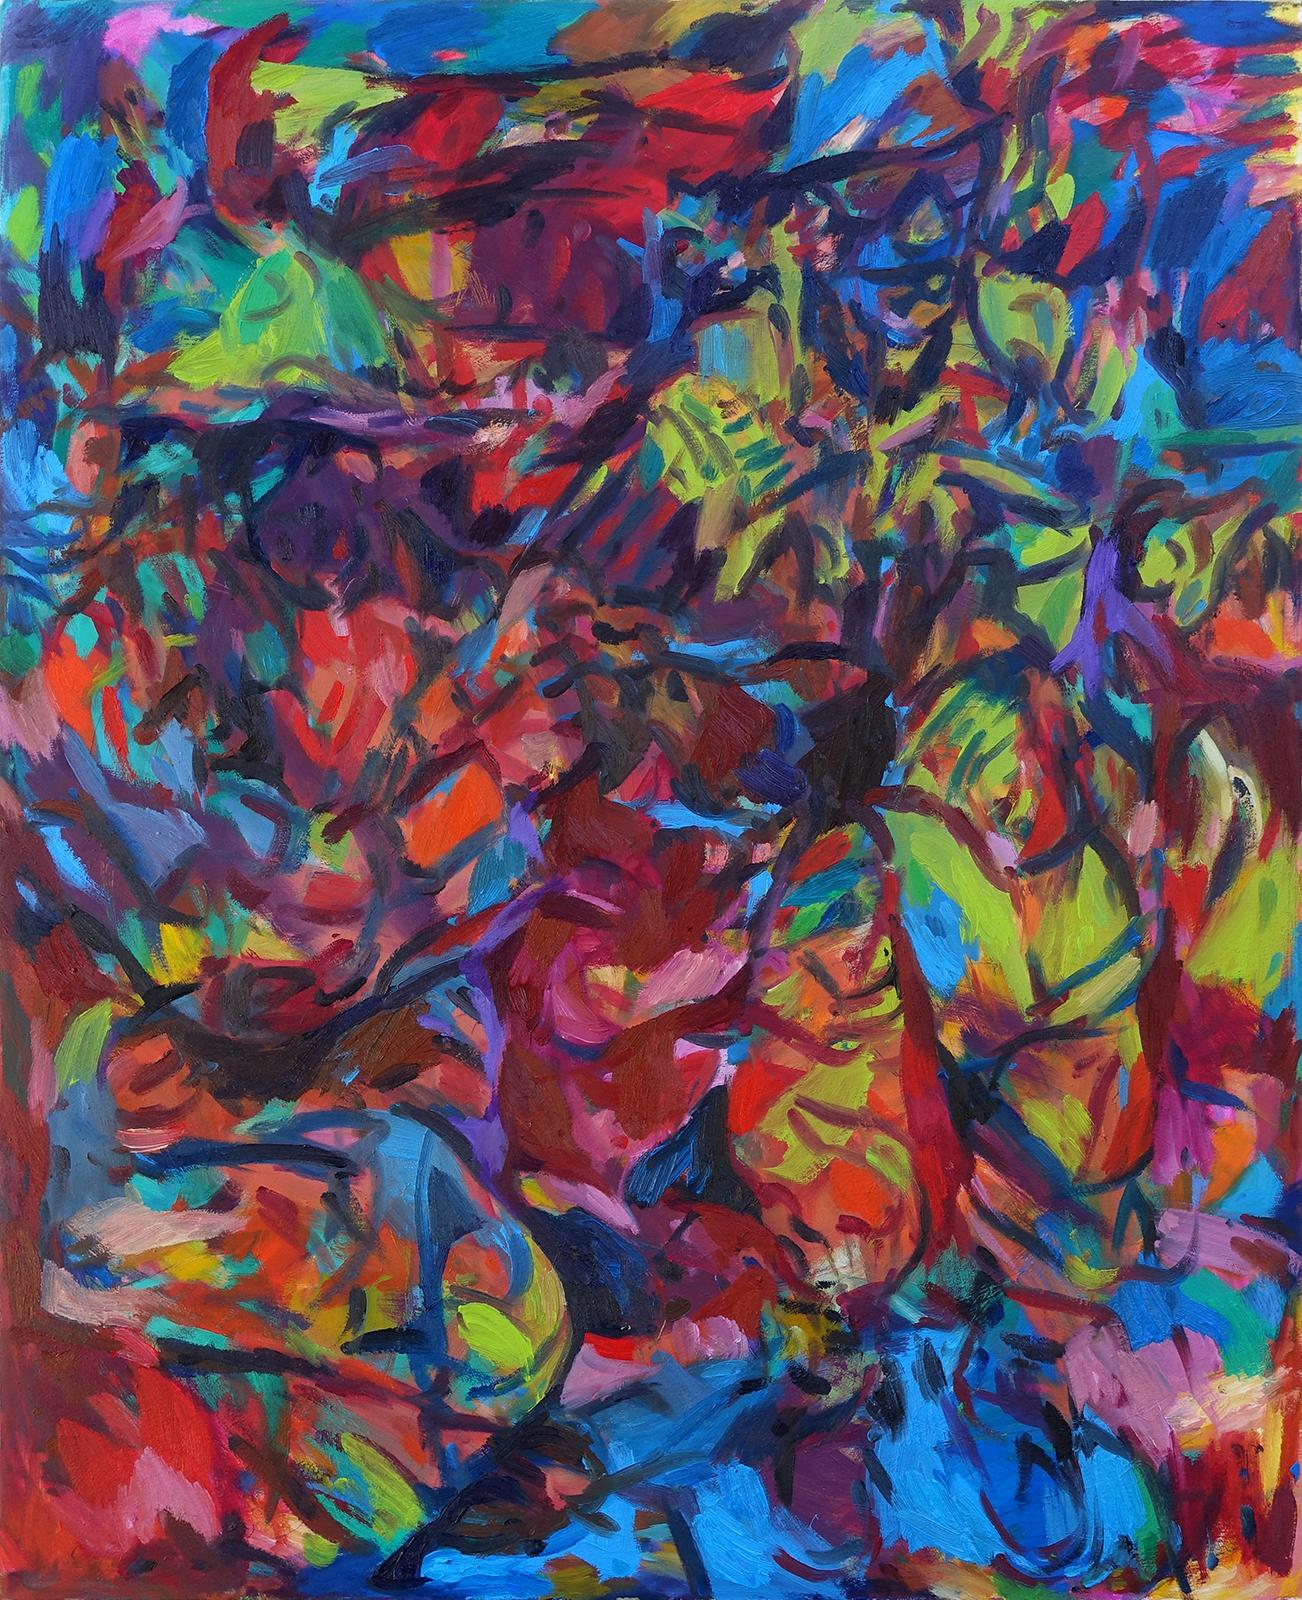 Josip Tirić, Toy story 2, 2021, Oil on canvas, 110 x 90 cm, 43 x 35.4 in, © The Artist